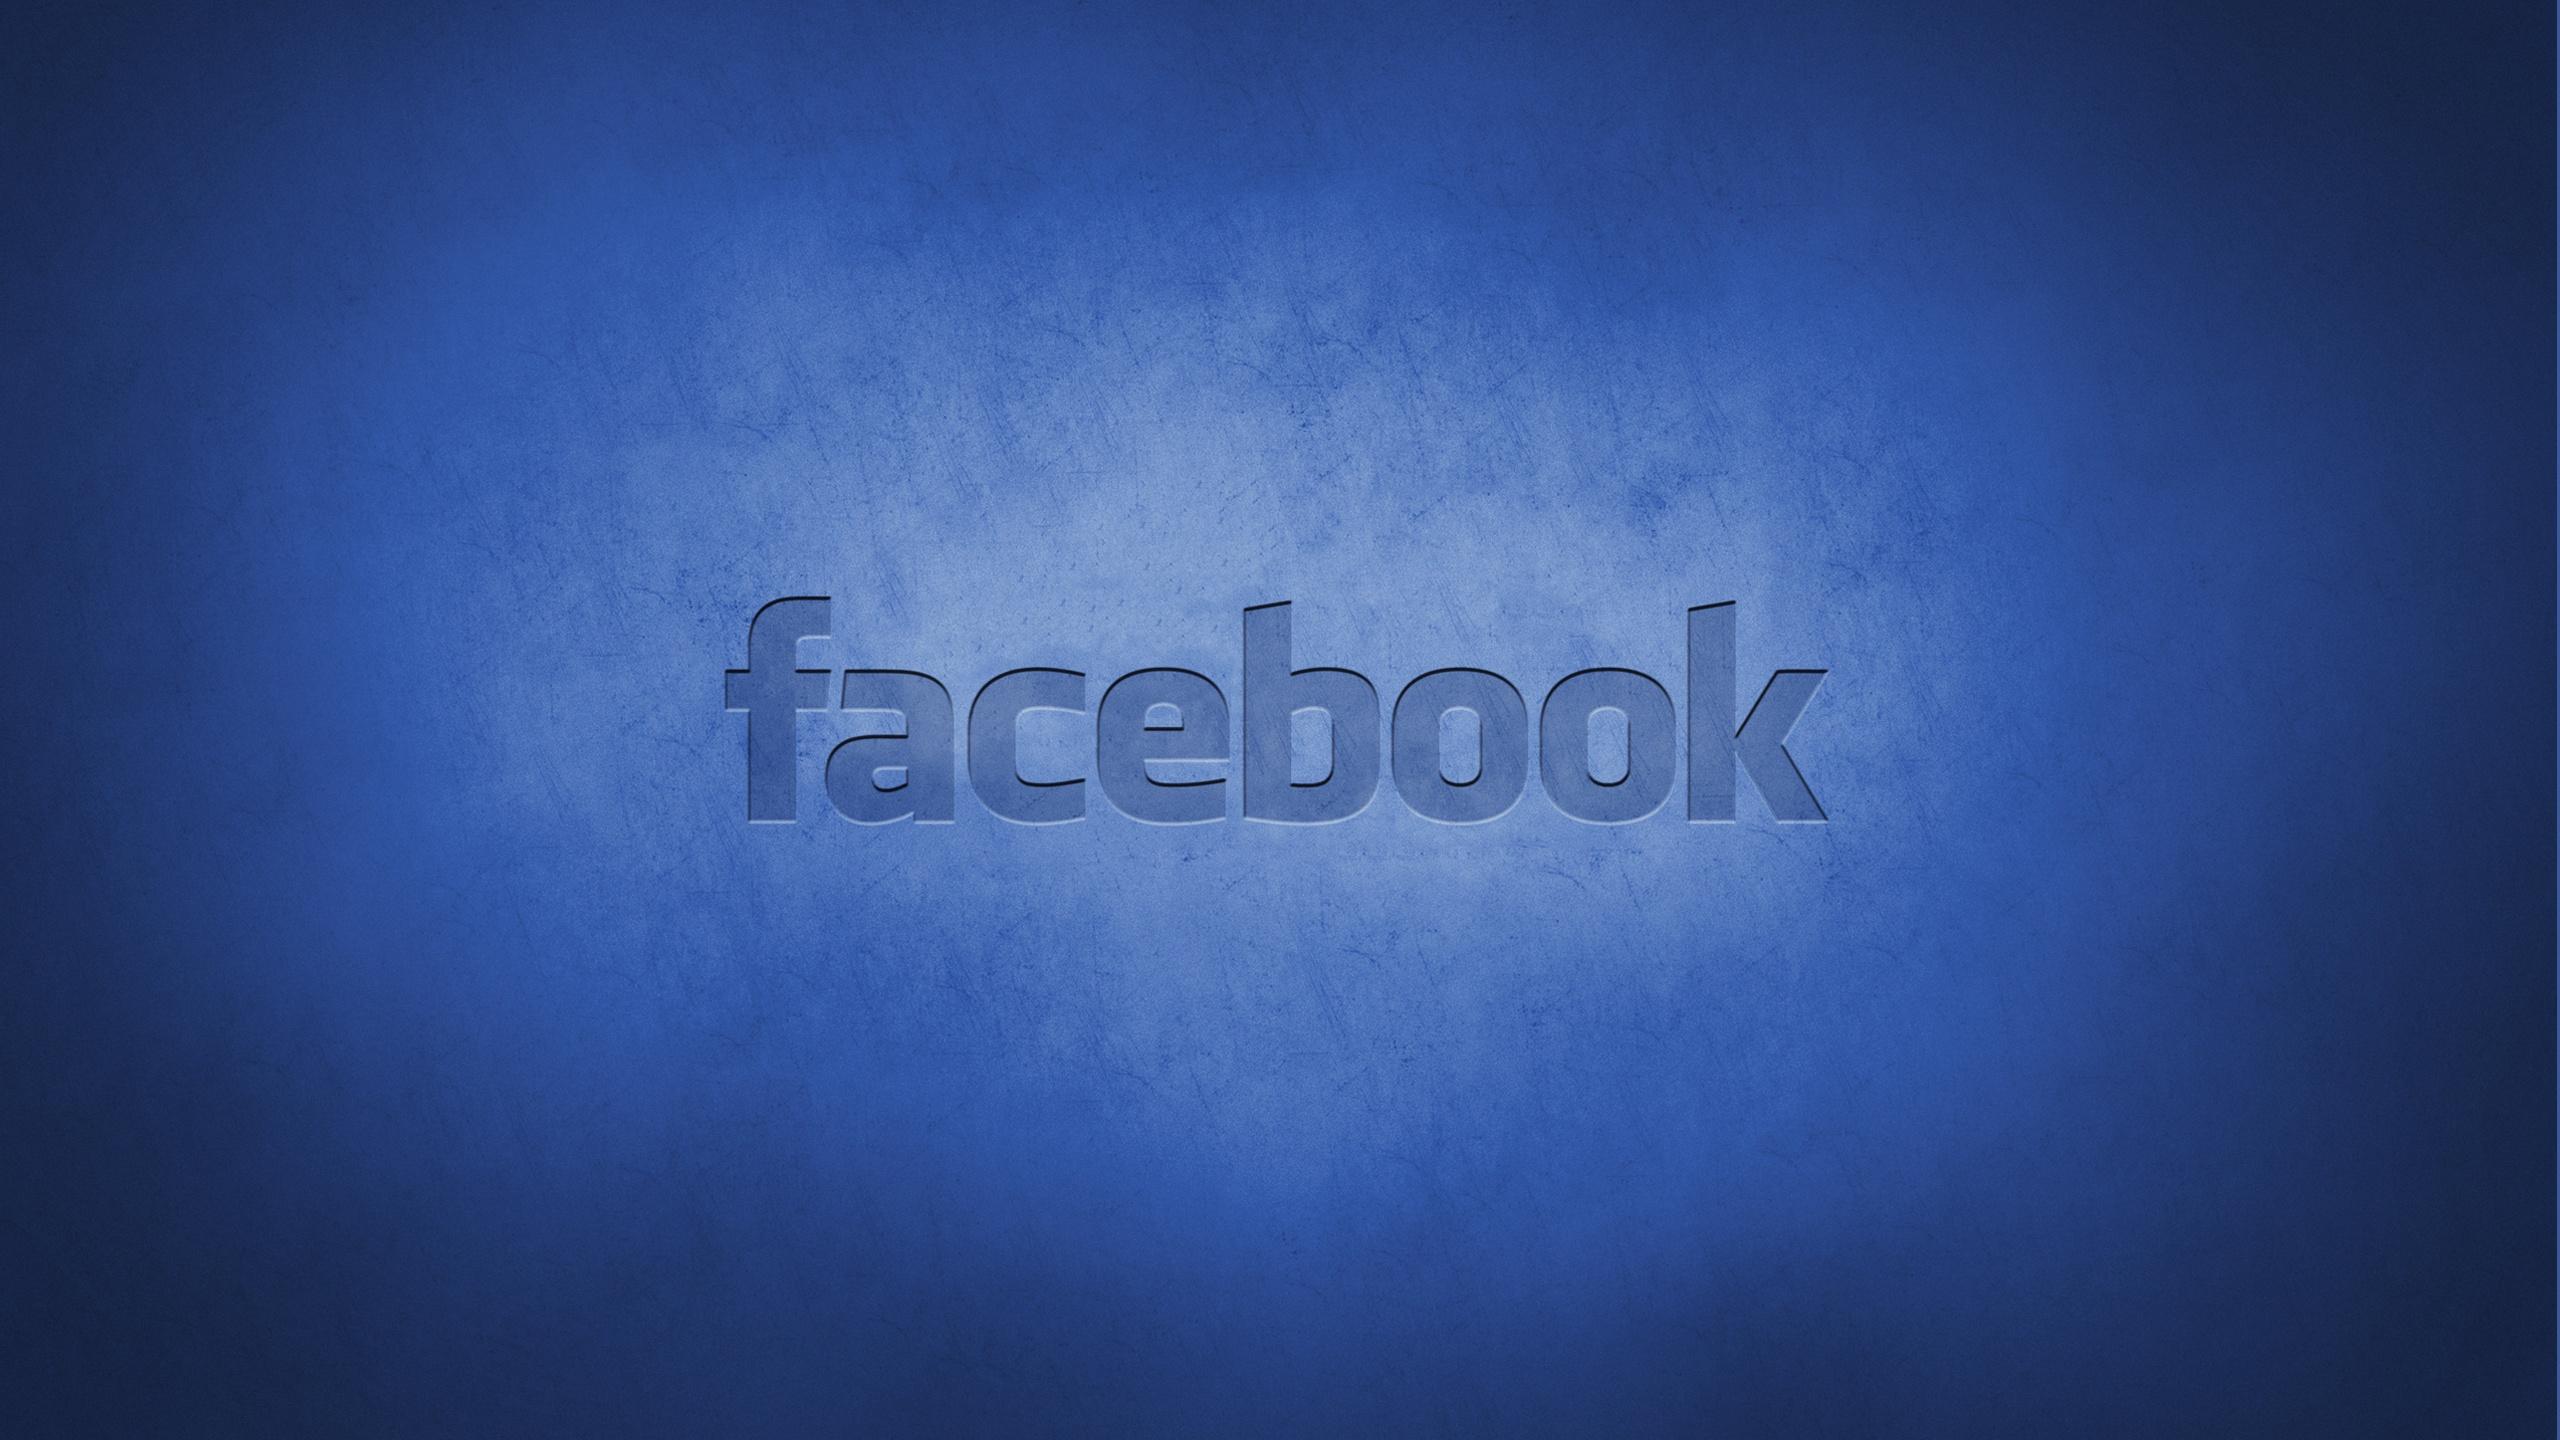 Facebook: Valuation Update